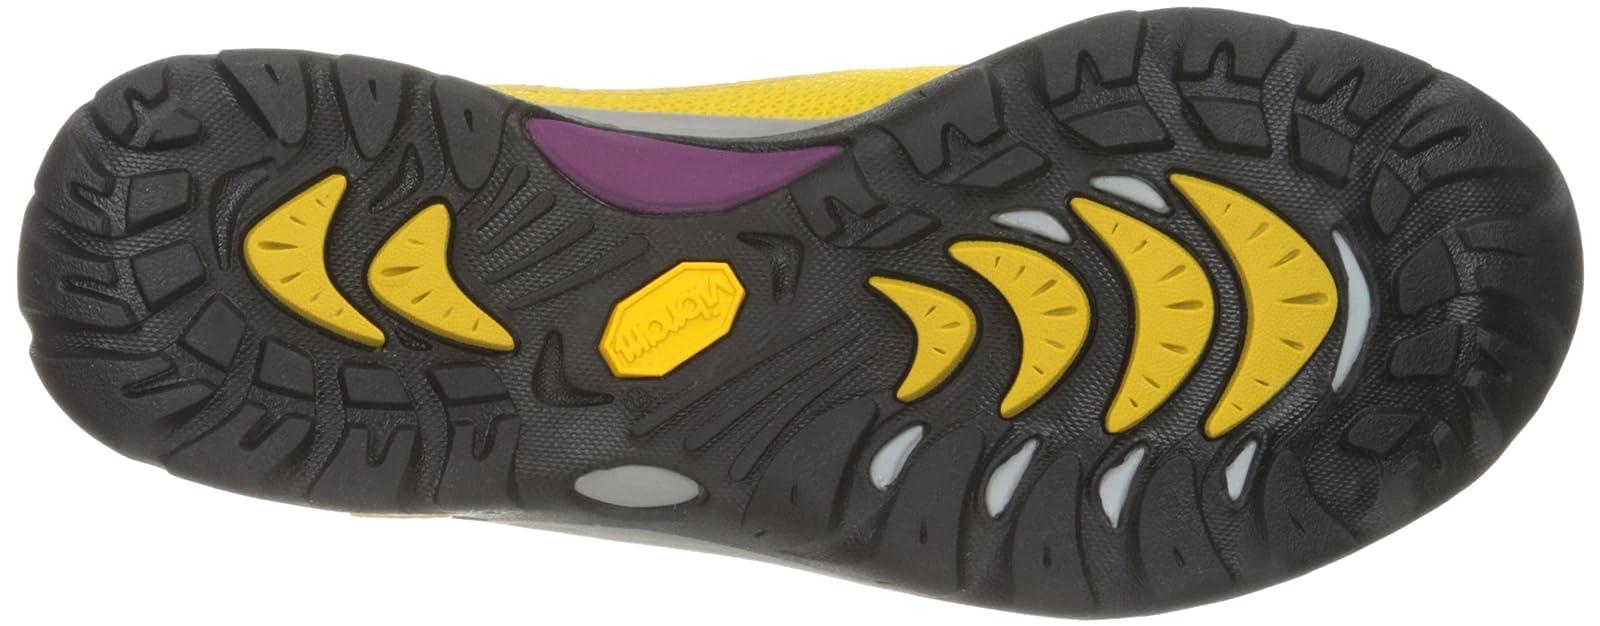 Ahnu Women's Calaveras Waterproof Hiking Shoe 5 M US - 3